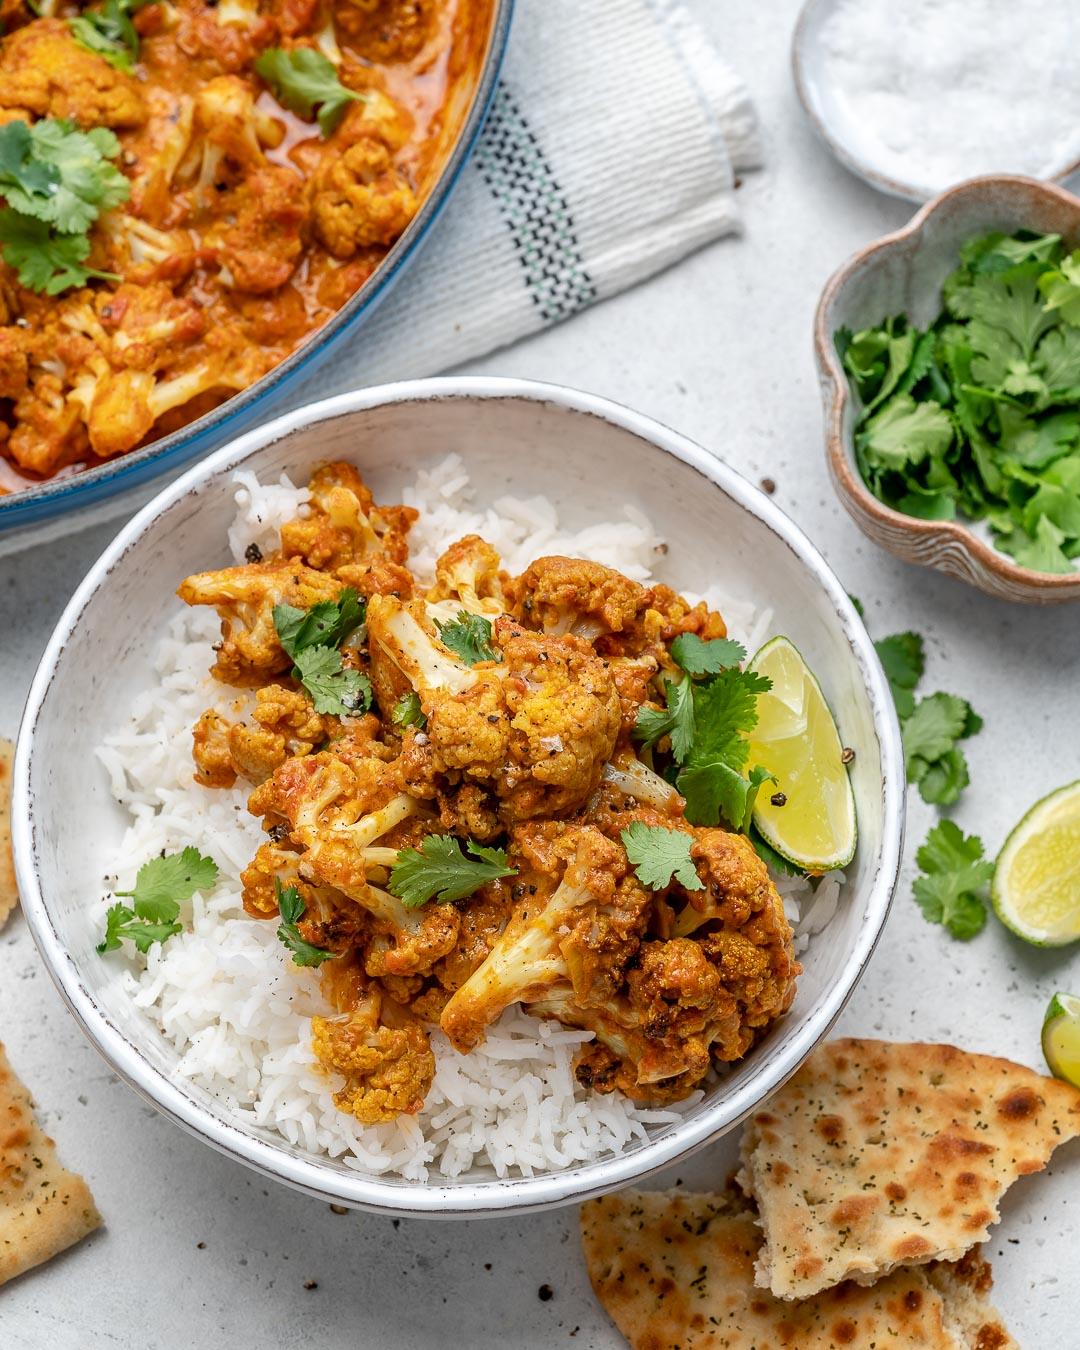 Mancare Indiana De Conopida (Curry Vegan, Paleo & Whole30) 10